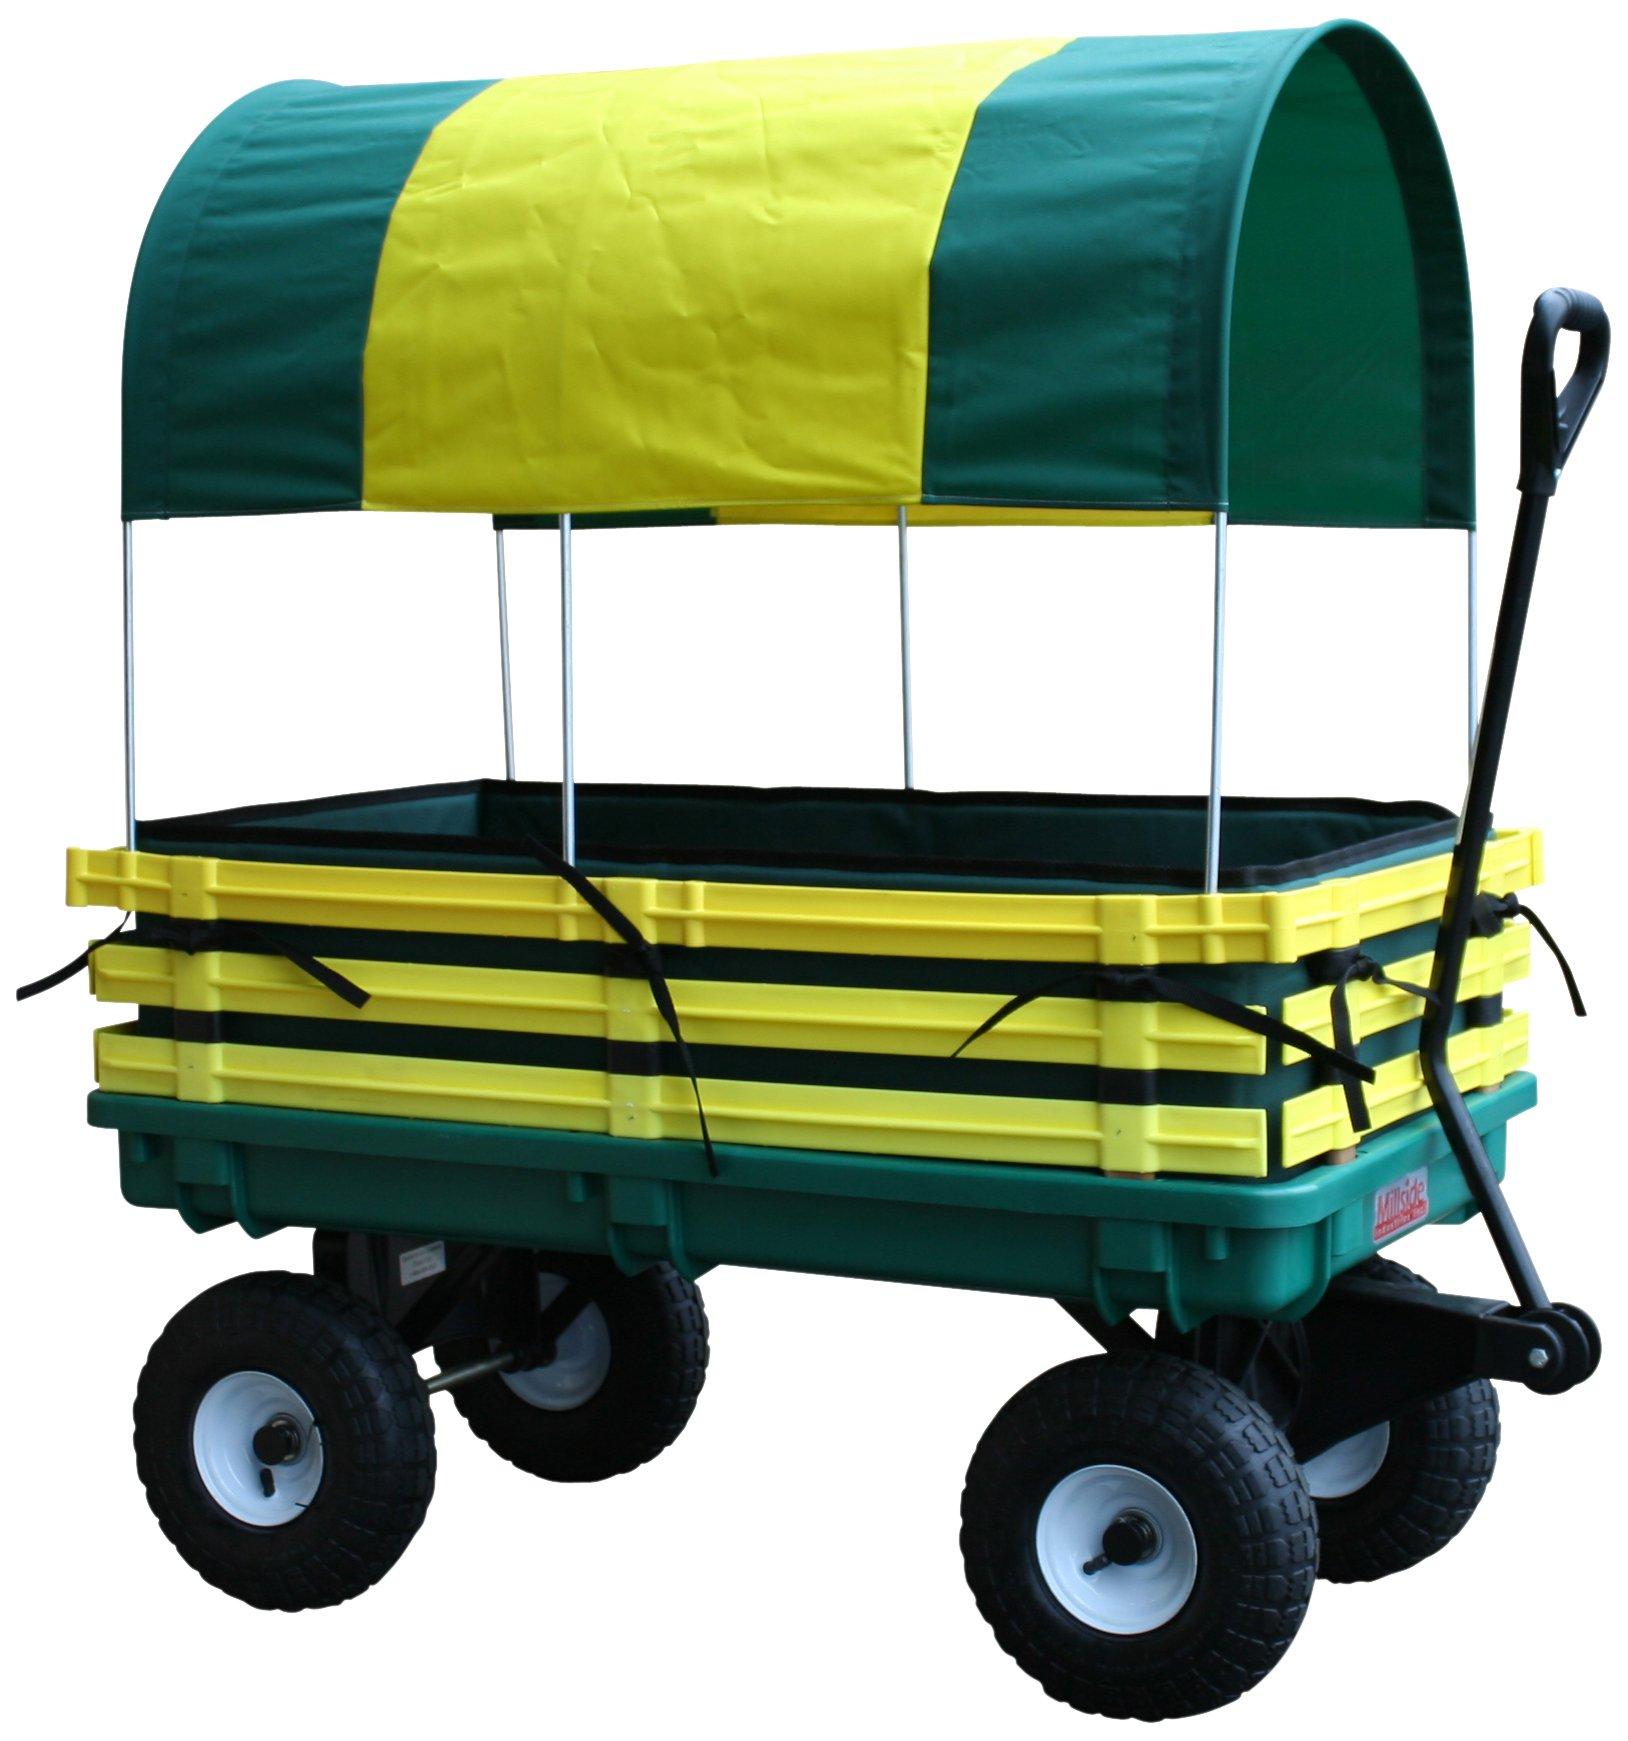 Millside Industries Trekker Wagon with Yellow Poly Rack Set